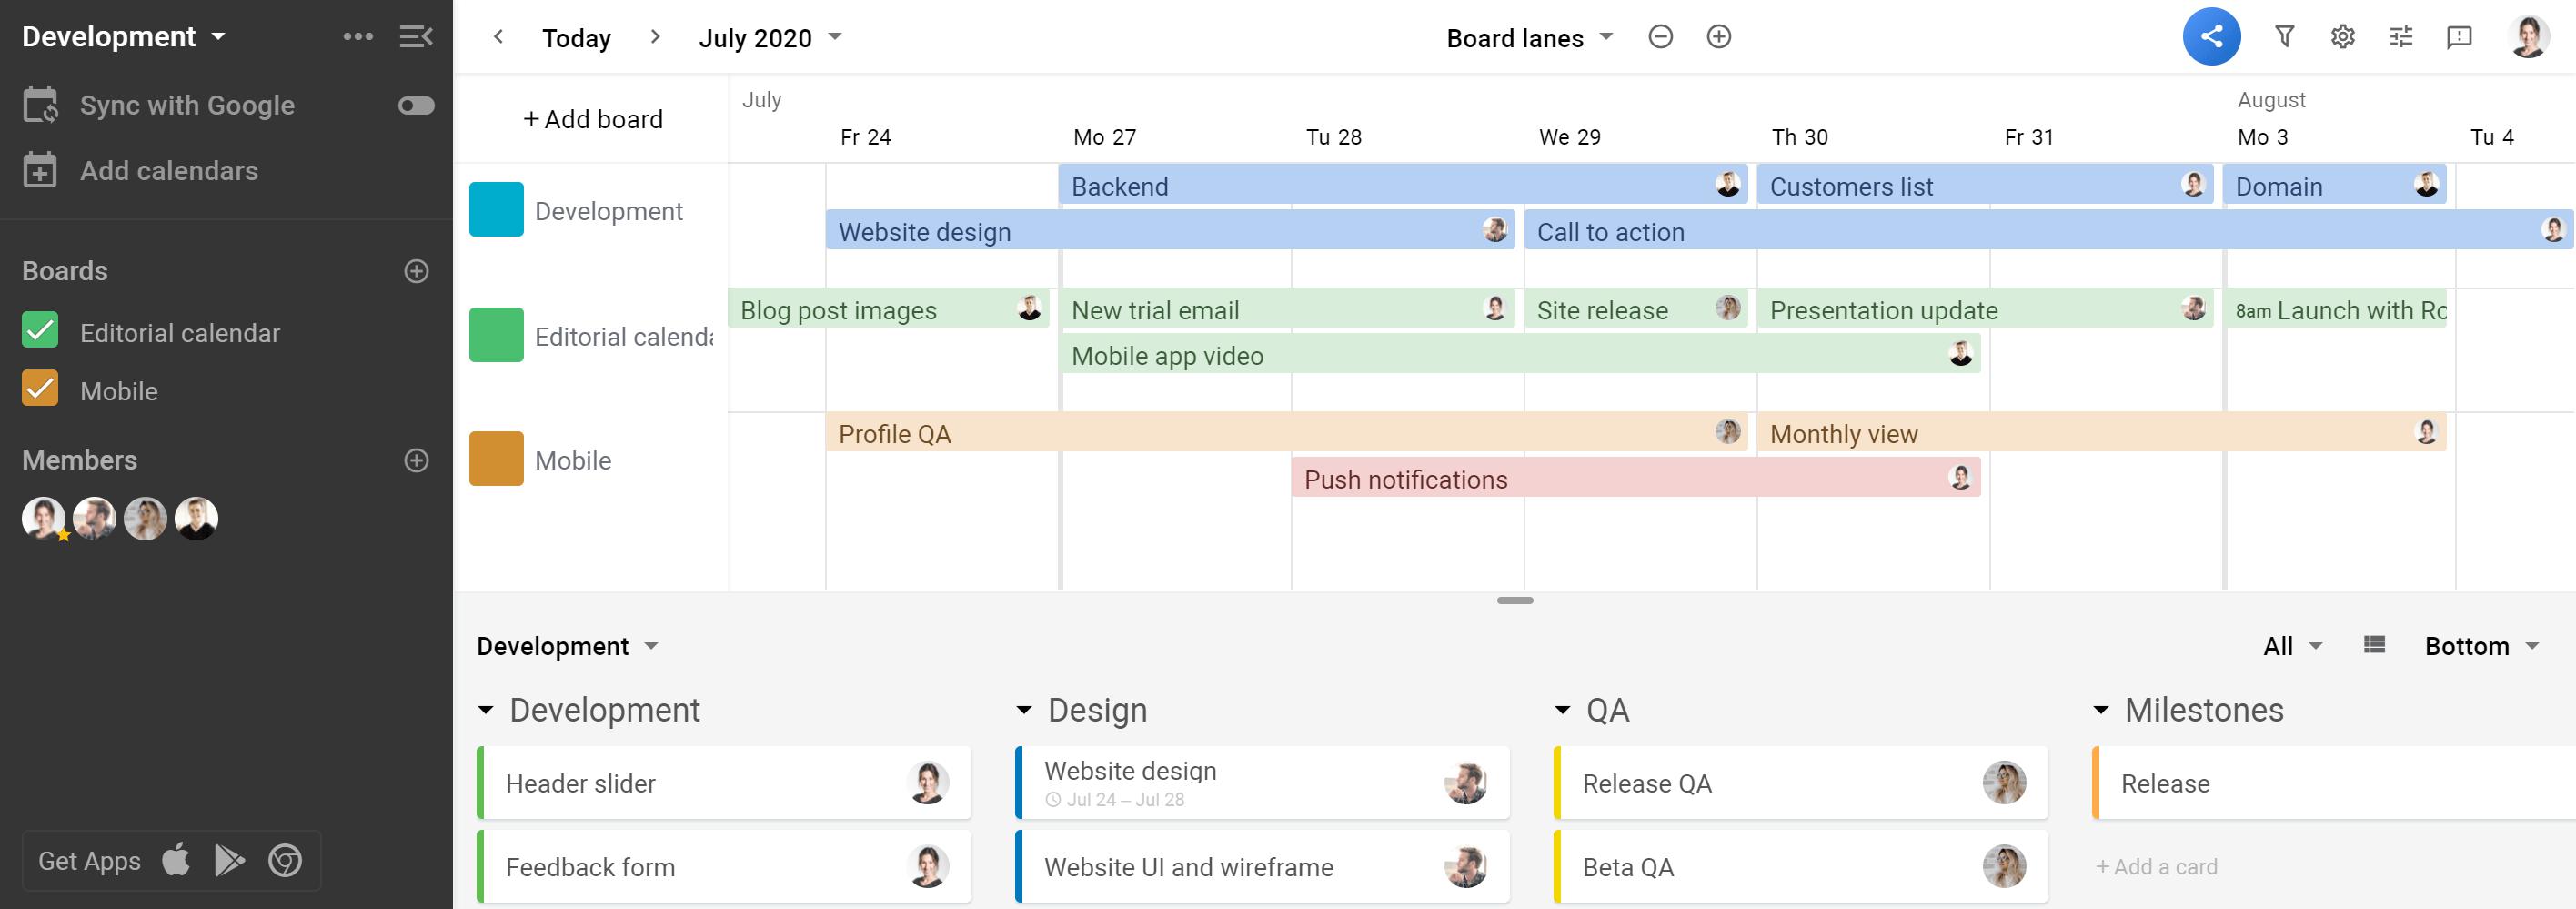 Planyway Team timeline portfolio mode